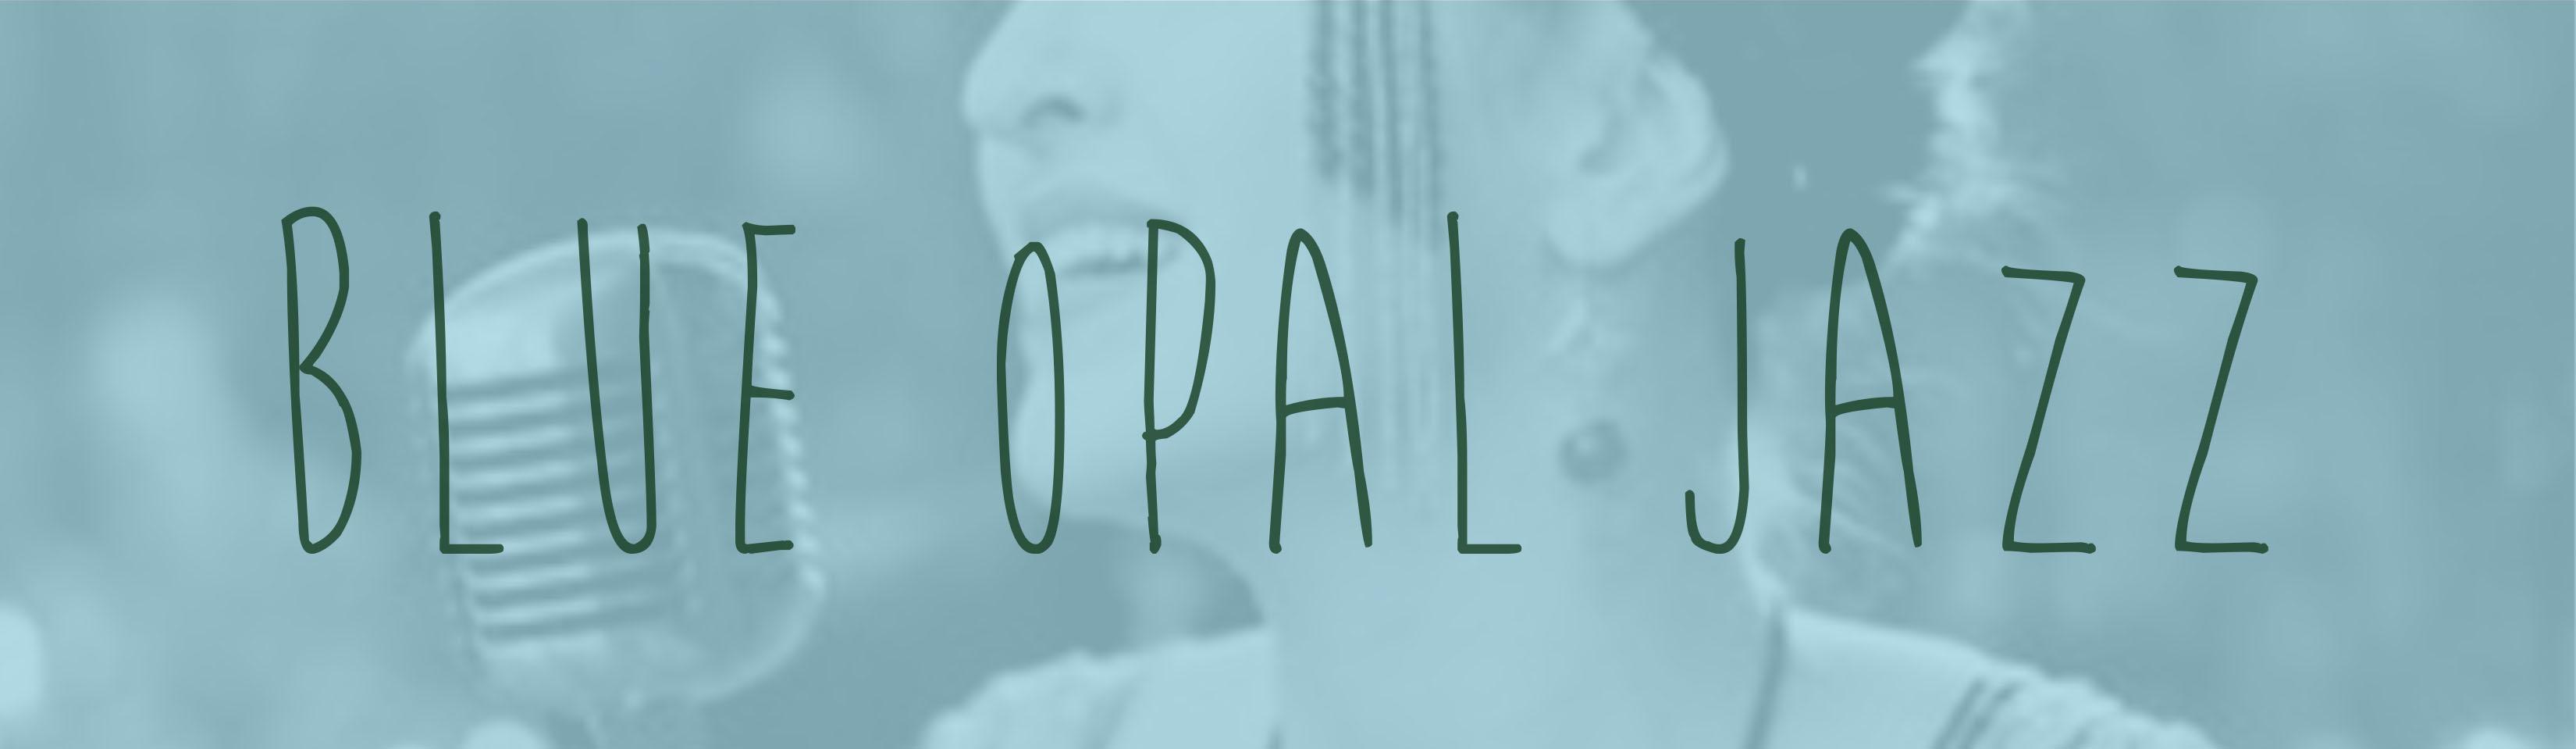 Blue Opal Jazz